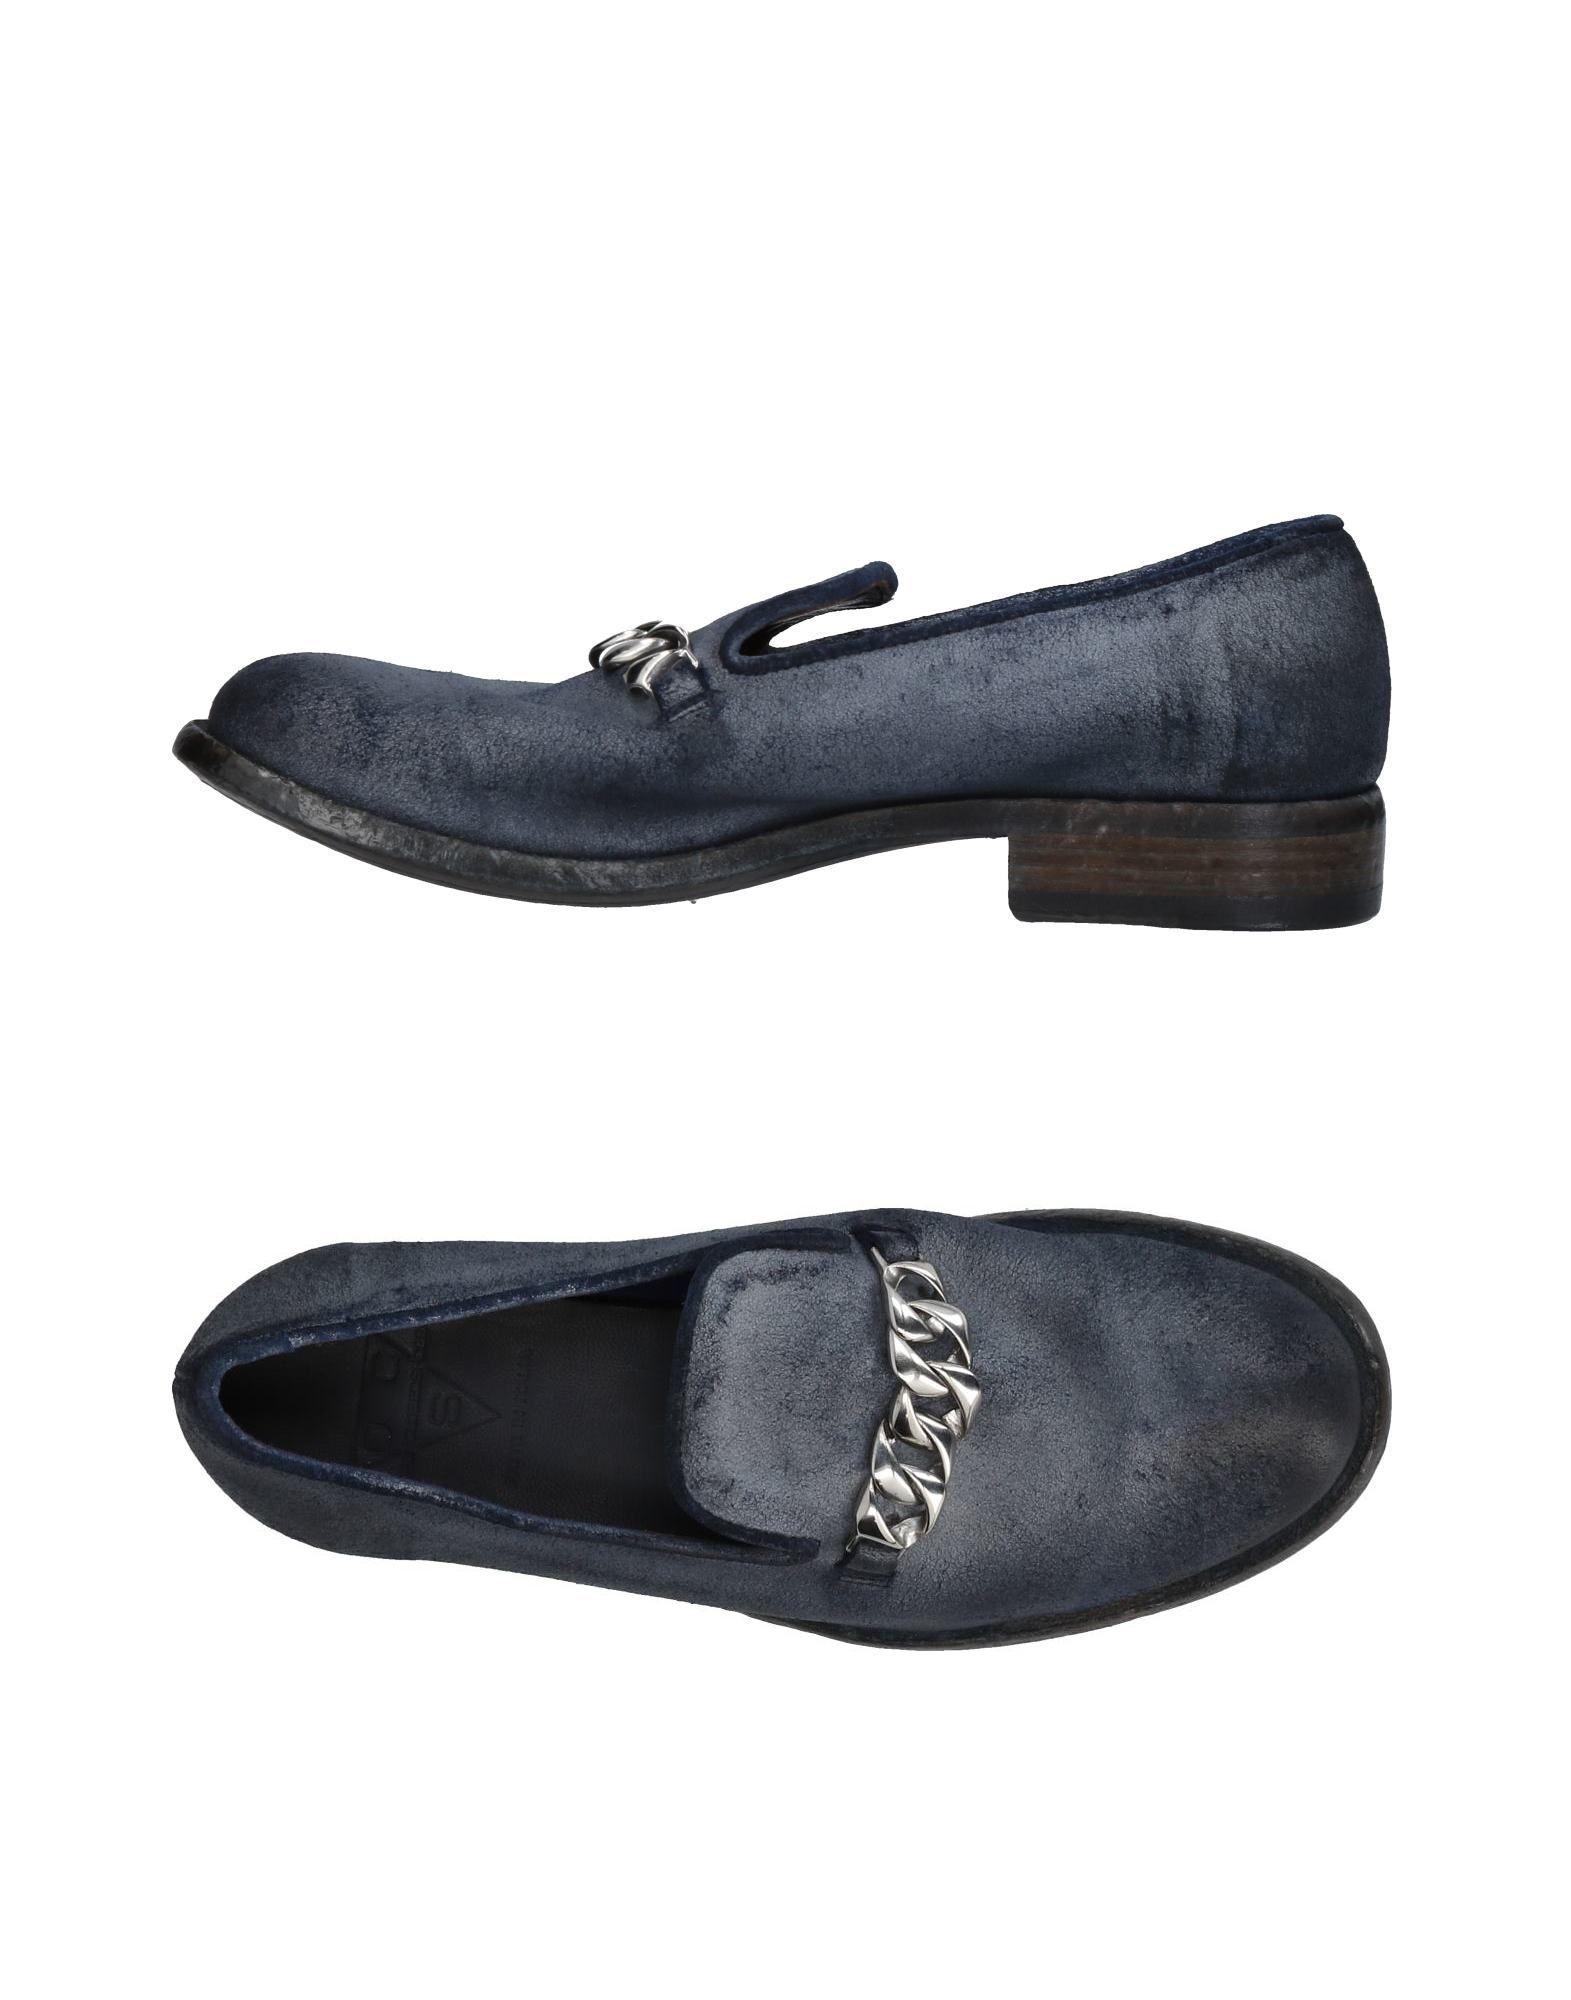 OPEN CLOSED SHOES Мокасины kemekiss women peep open toe high heel sandals thin heels wedding shoes woman back strap heeled footwear size30 46 pa00328